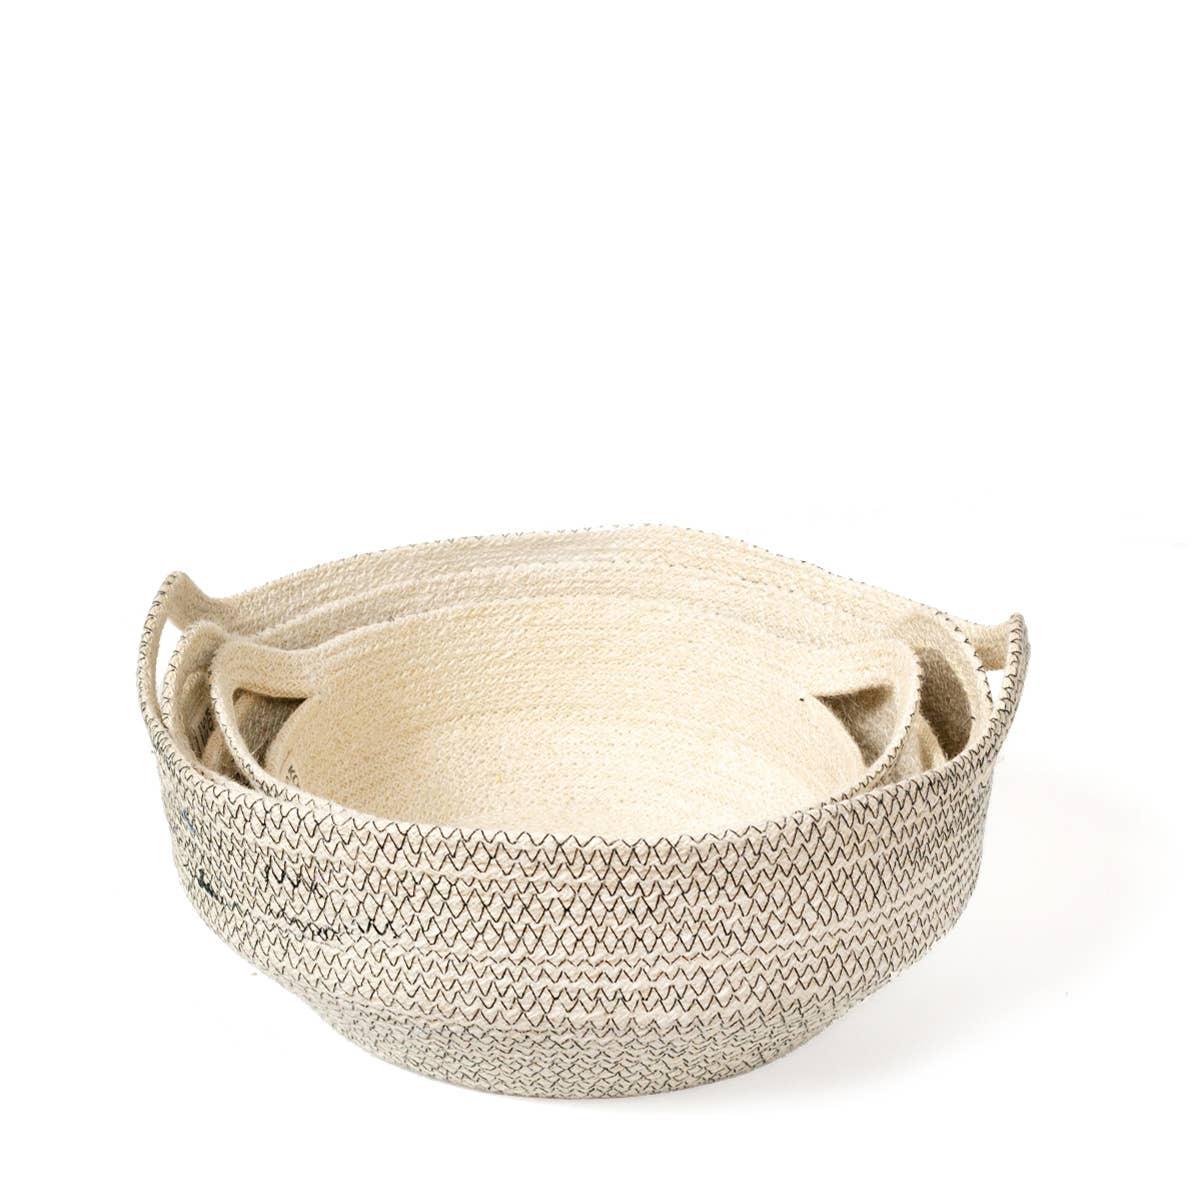 Amari Fruit Bowl - Black (Set of 3) | Trada Marketplace